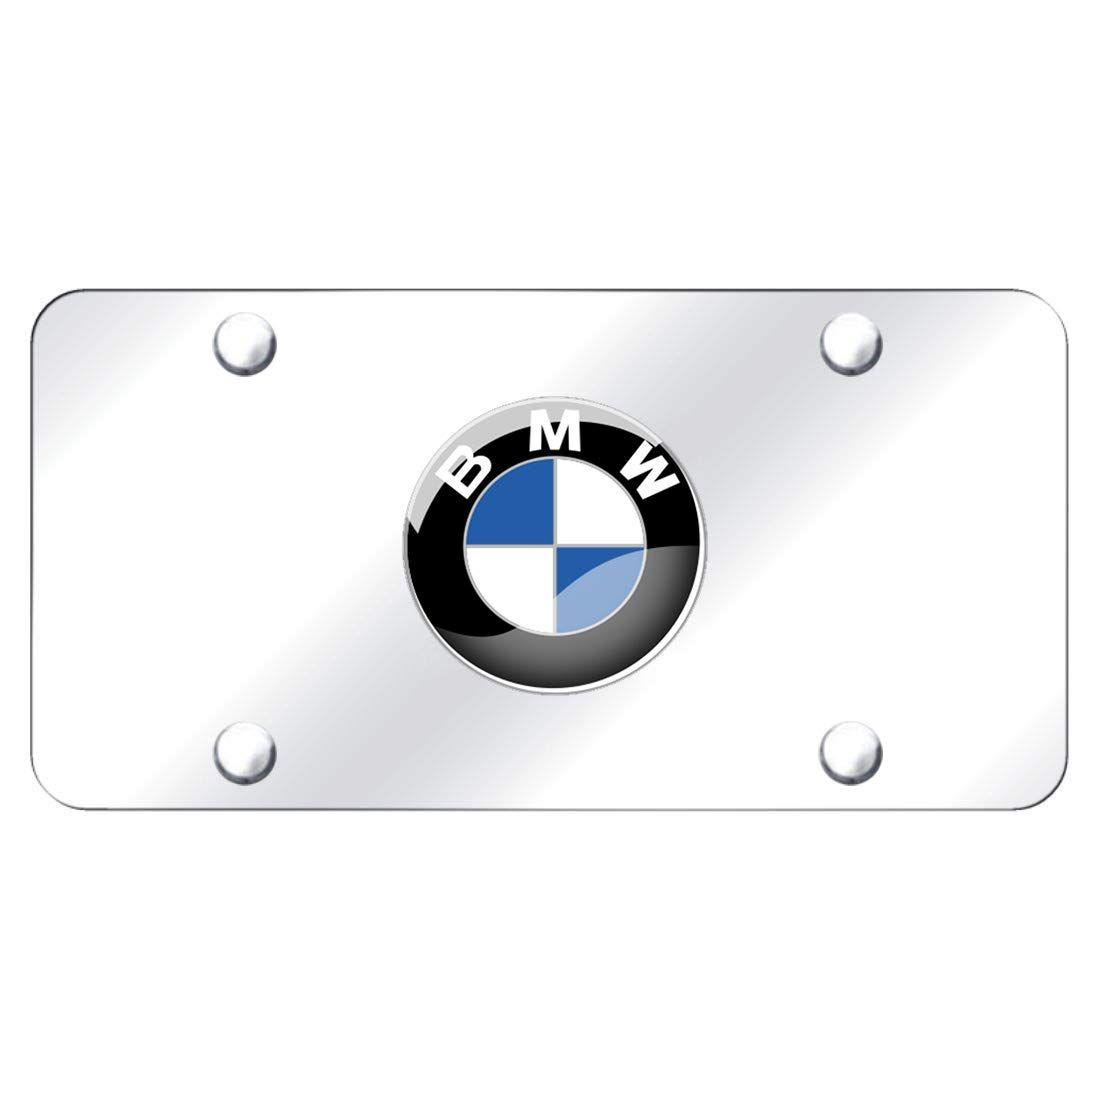 Silver 3D Stainless Steel BMW Emblem License Plate Frame